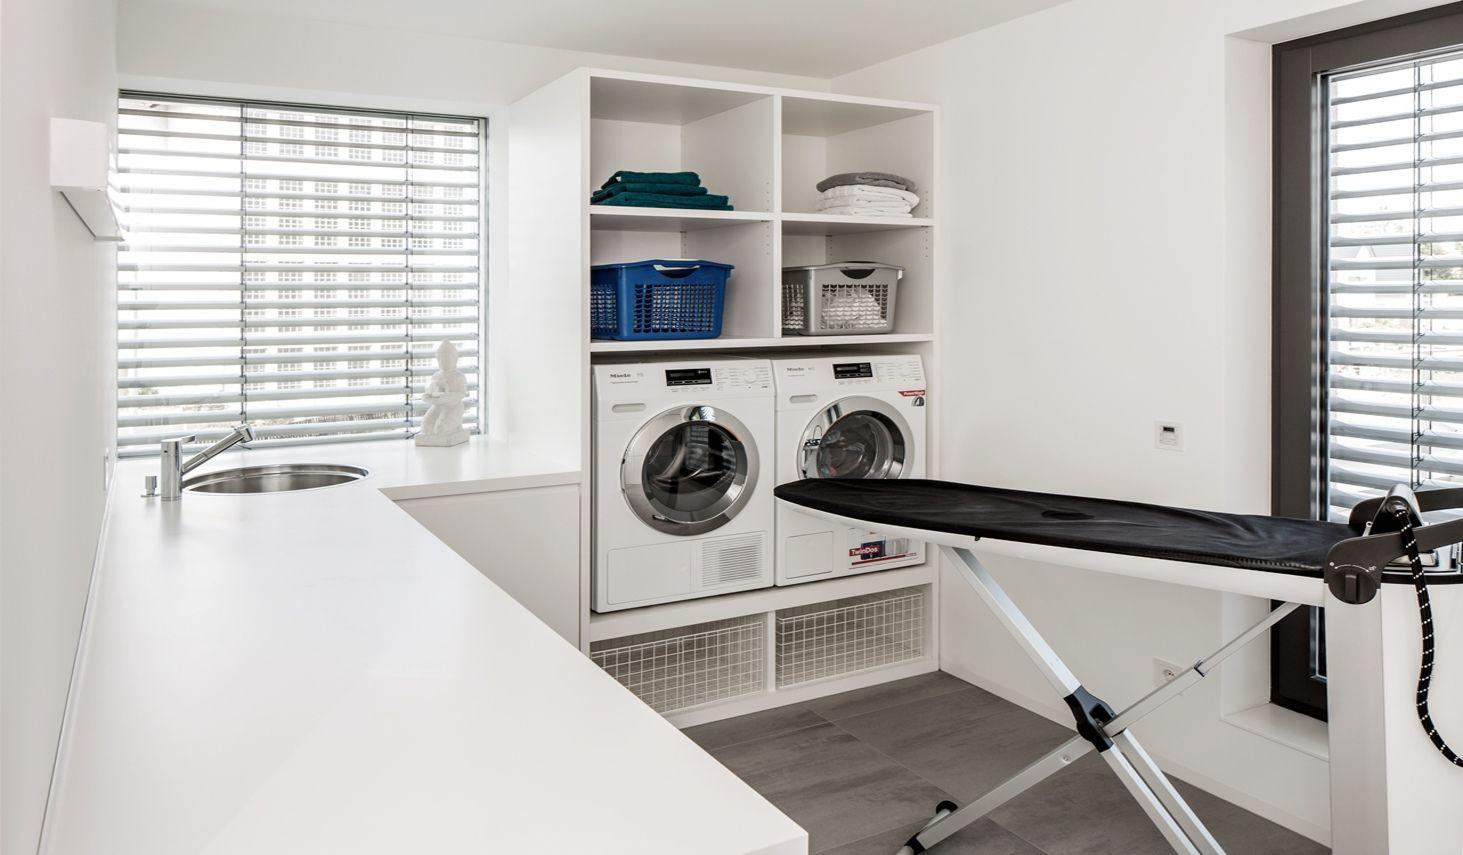 Neubau wh d mittelfranken 2015 cuarto de lavado for Diseno lavadero